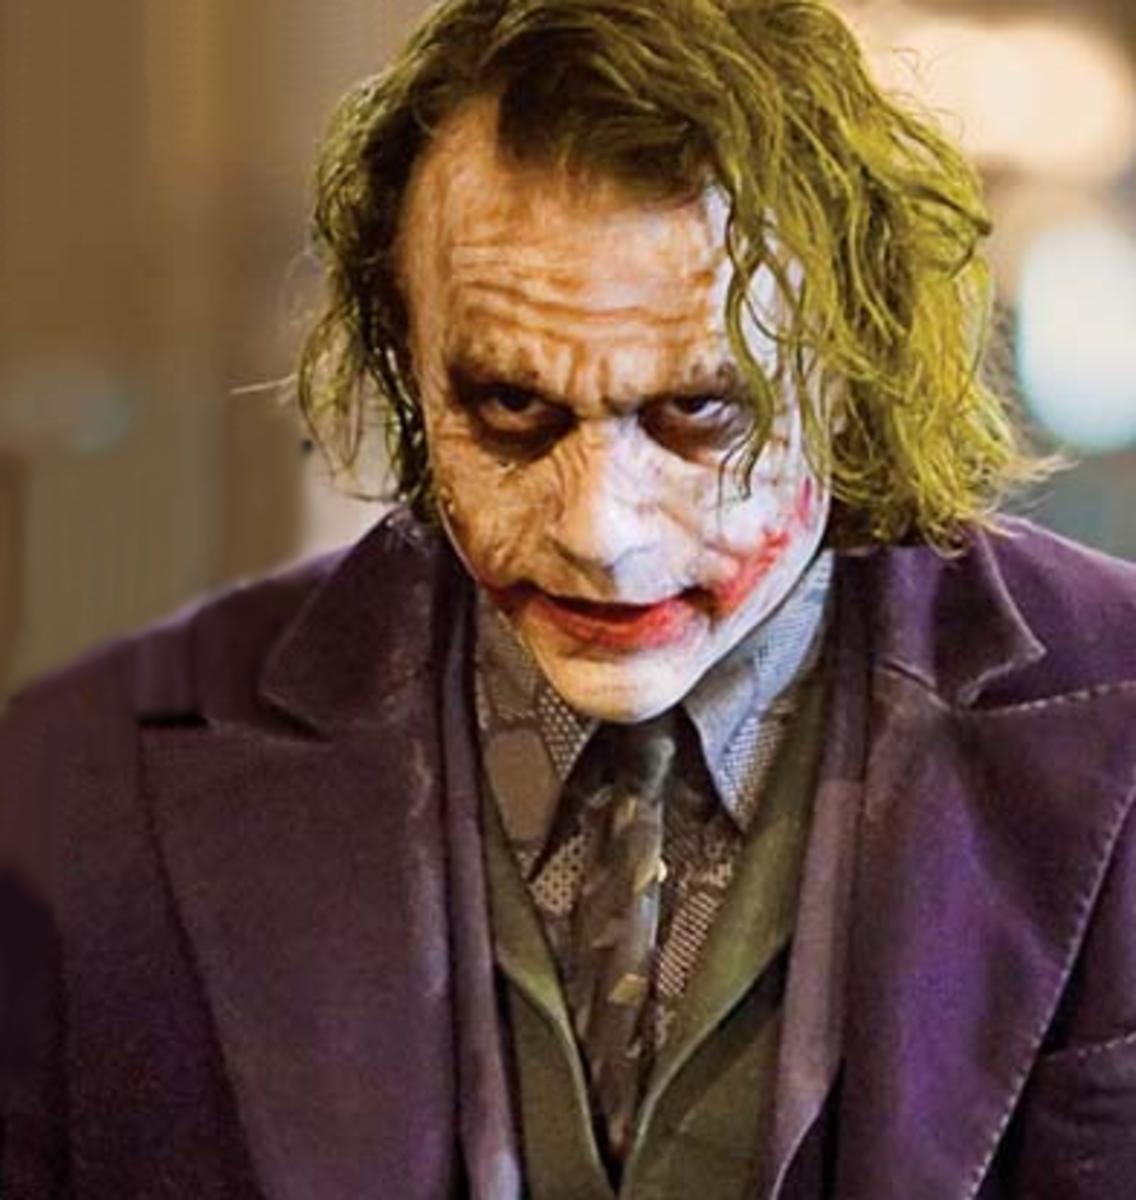 The Joker as a Satanic Character